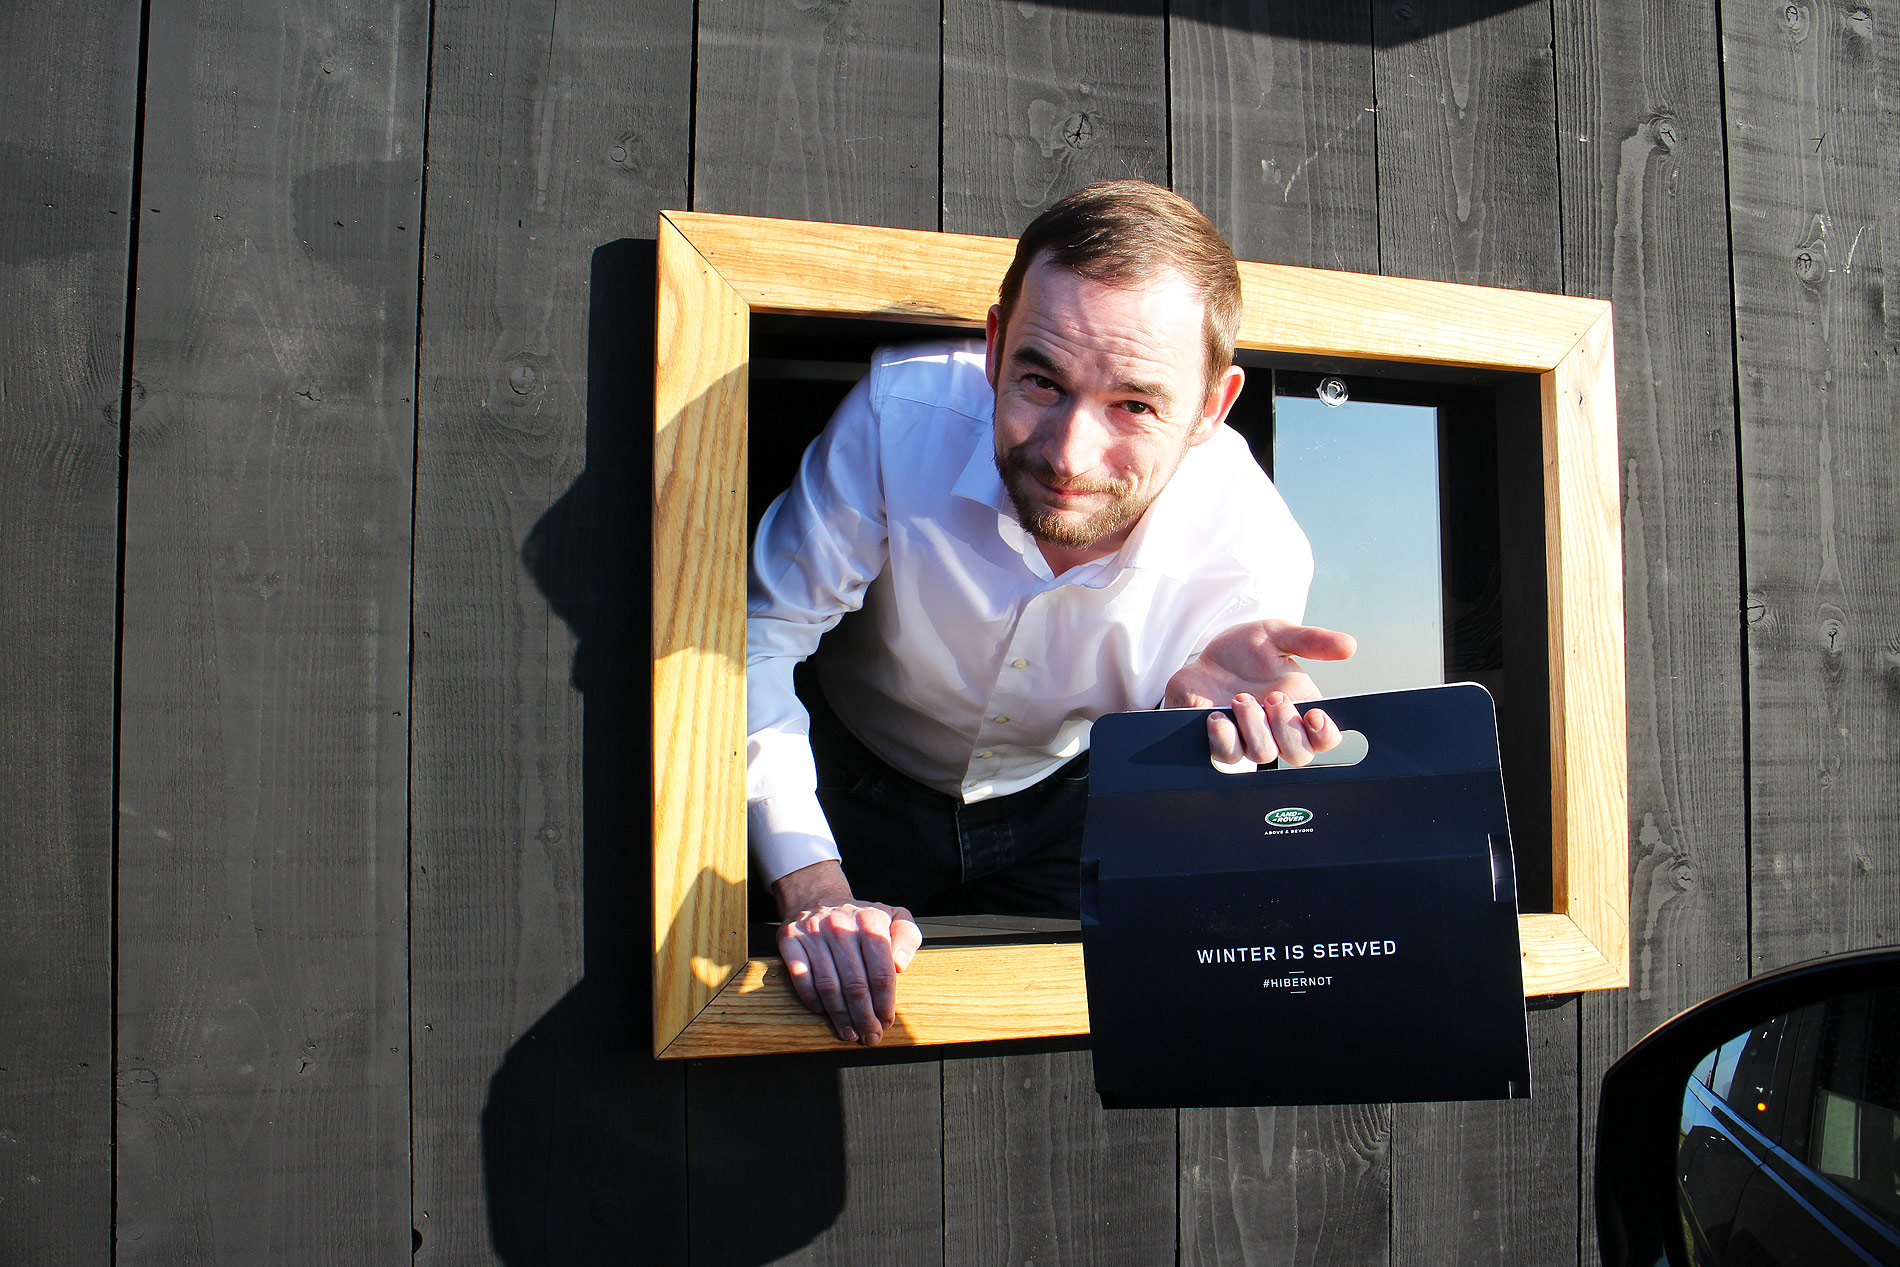 Land Rover & Chef Simon Rogan Create World's First Luxury Drive-Through